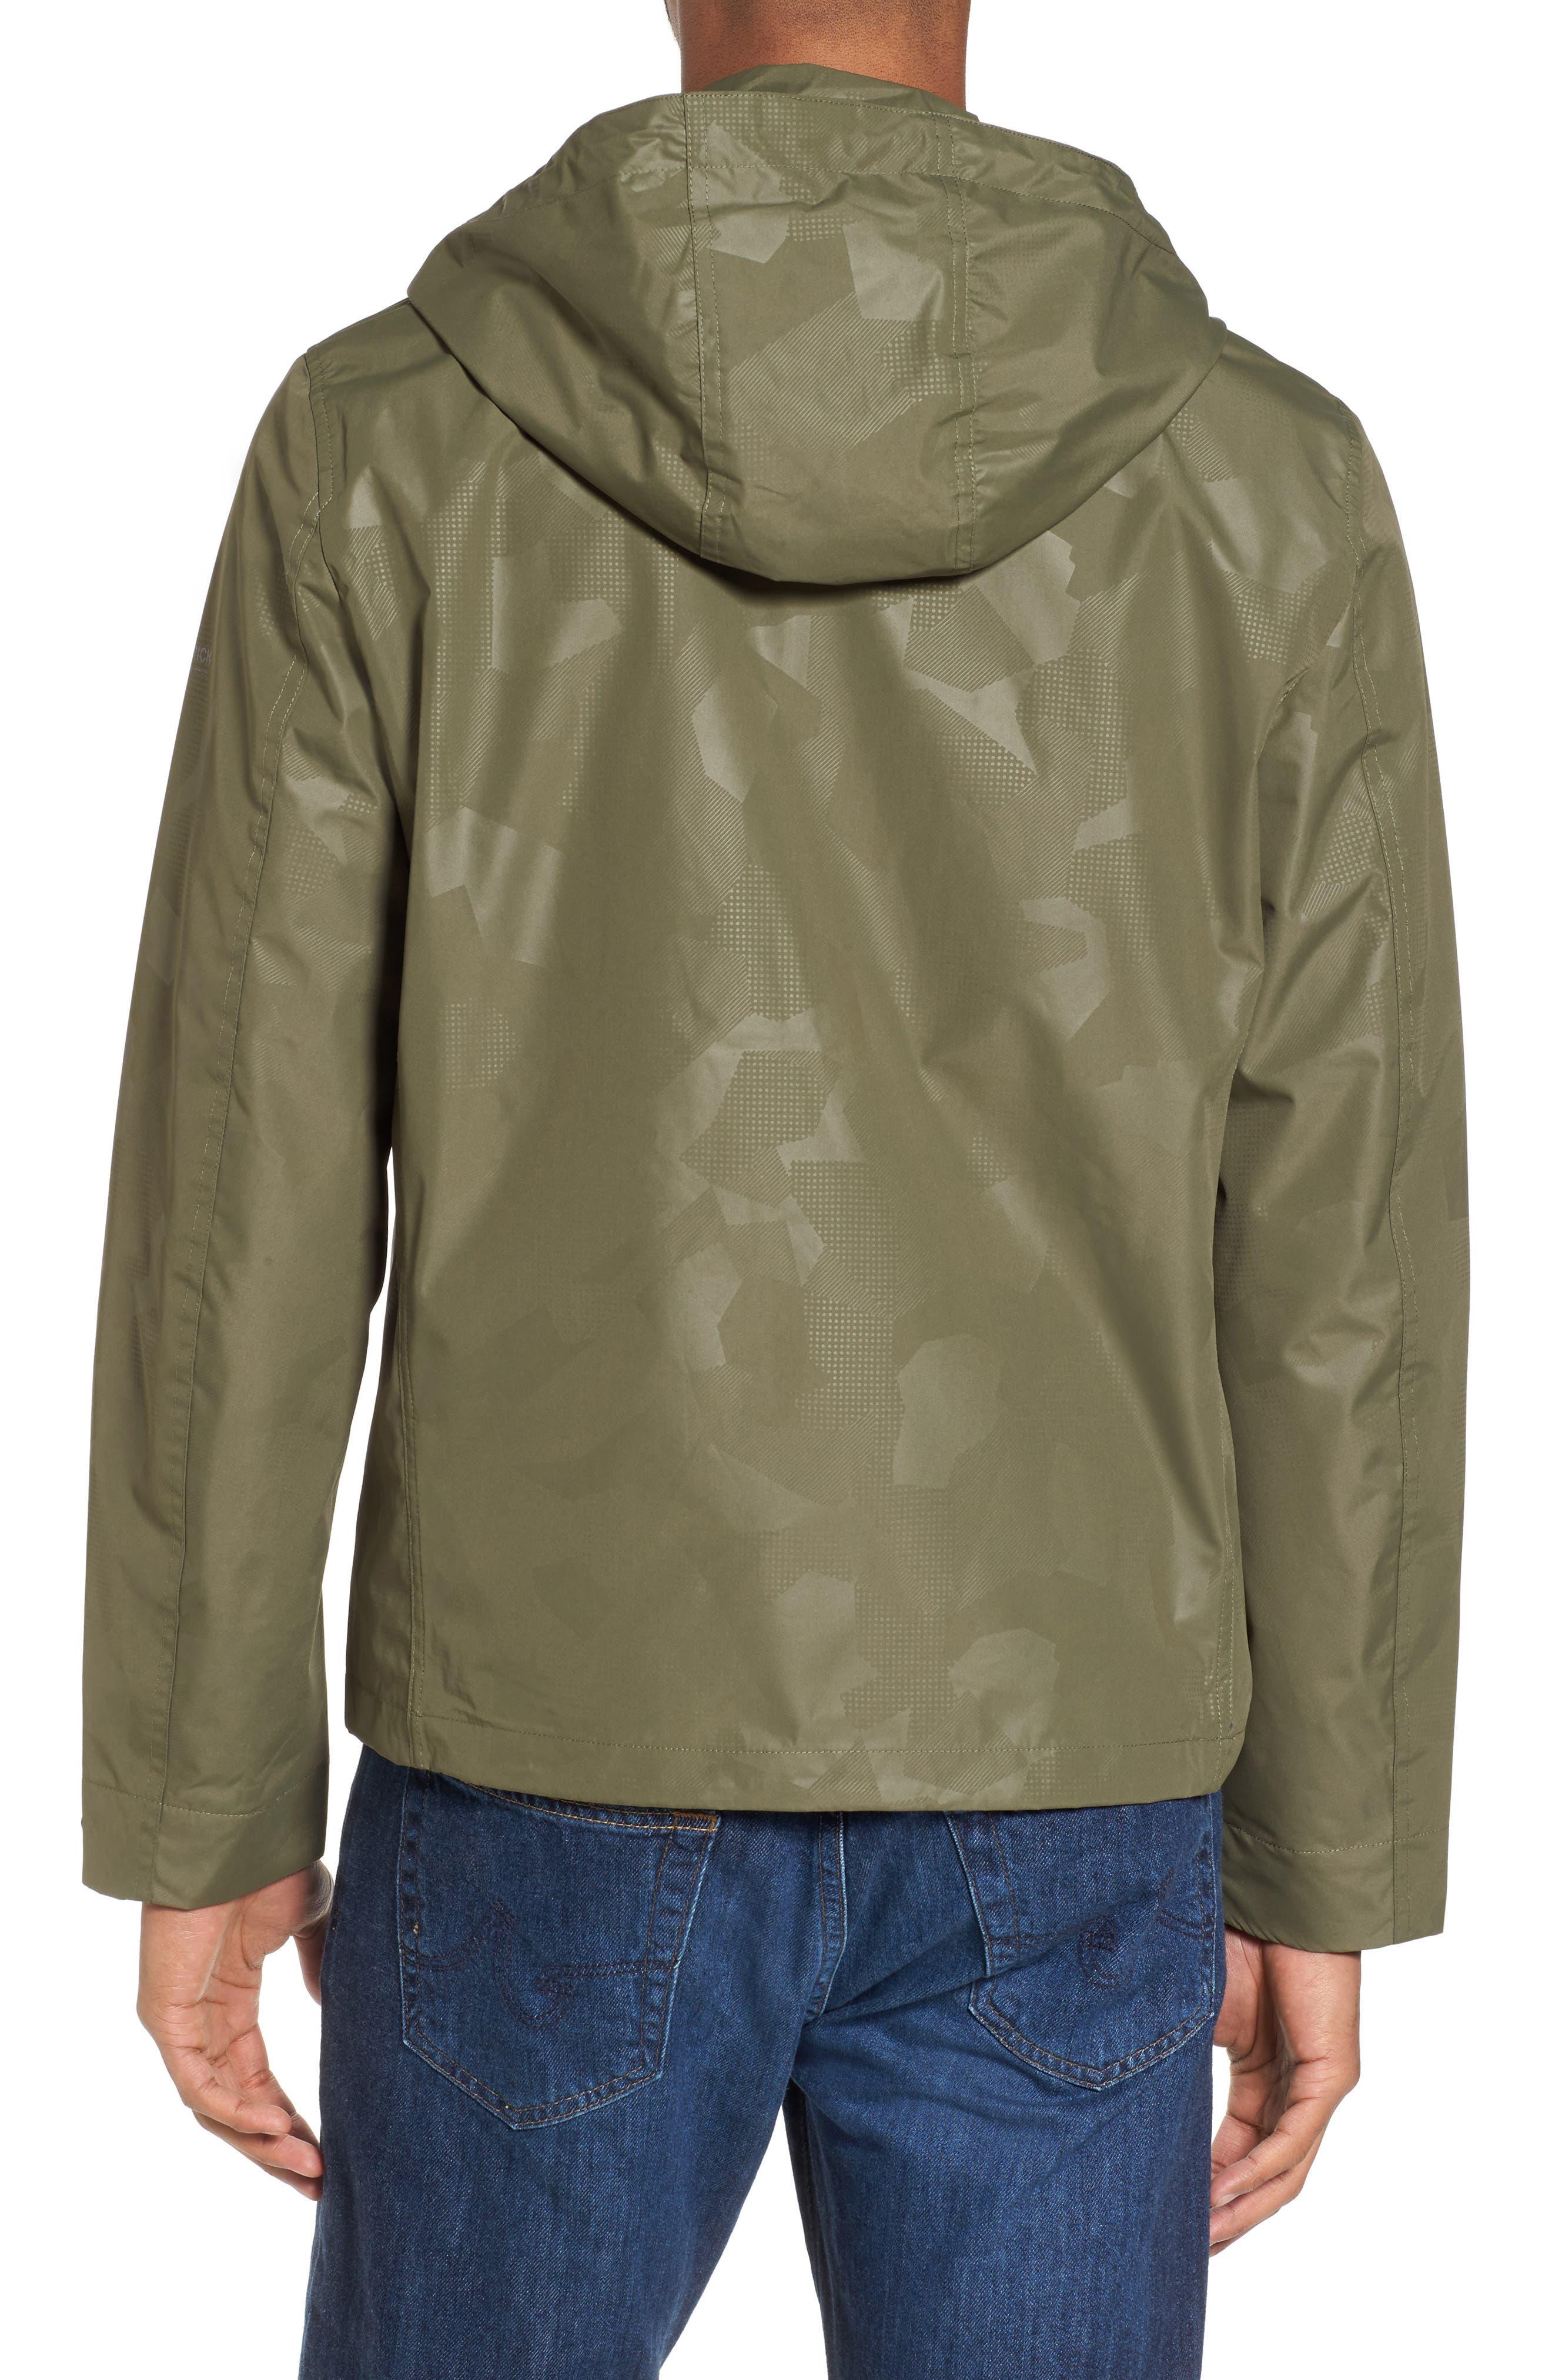 John Rich & Bros. Atlantic Camo Hooded Jacket,                             Alternate thumbnail 2, color,                             378